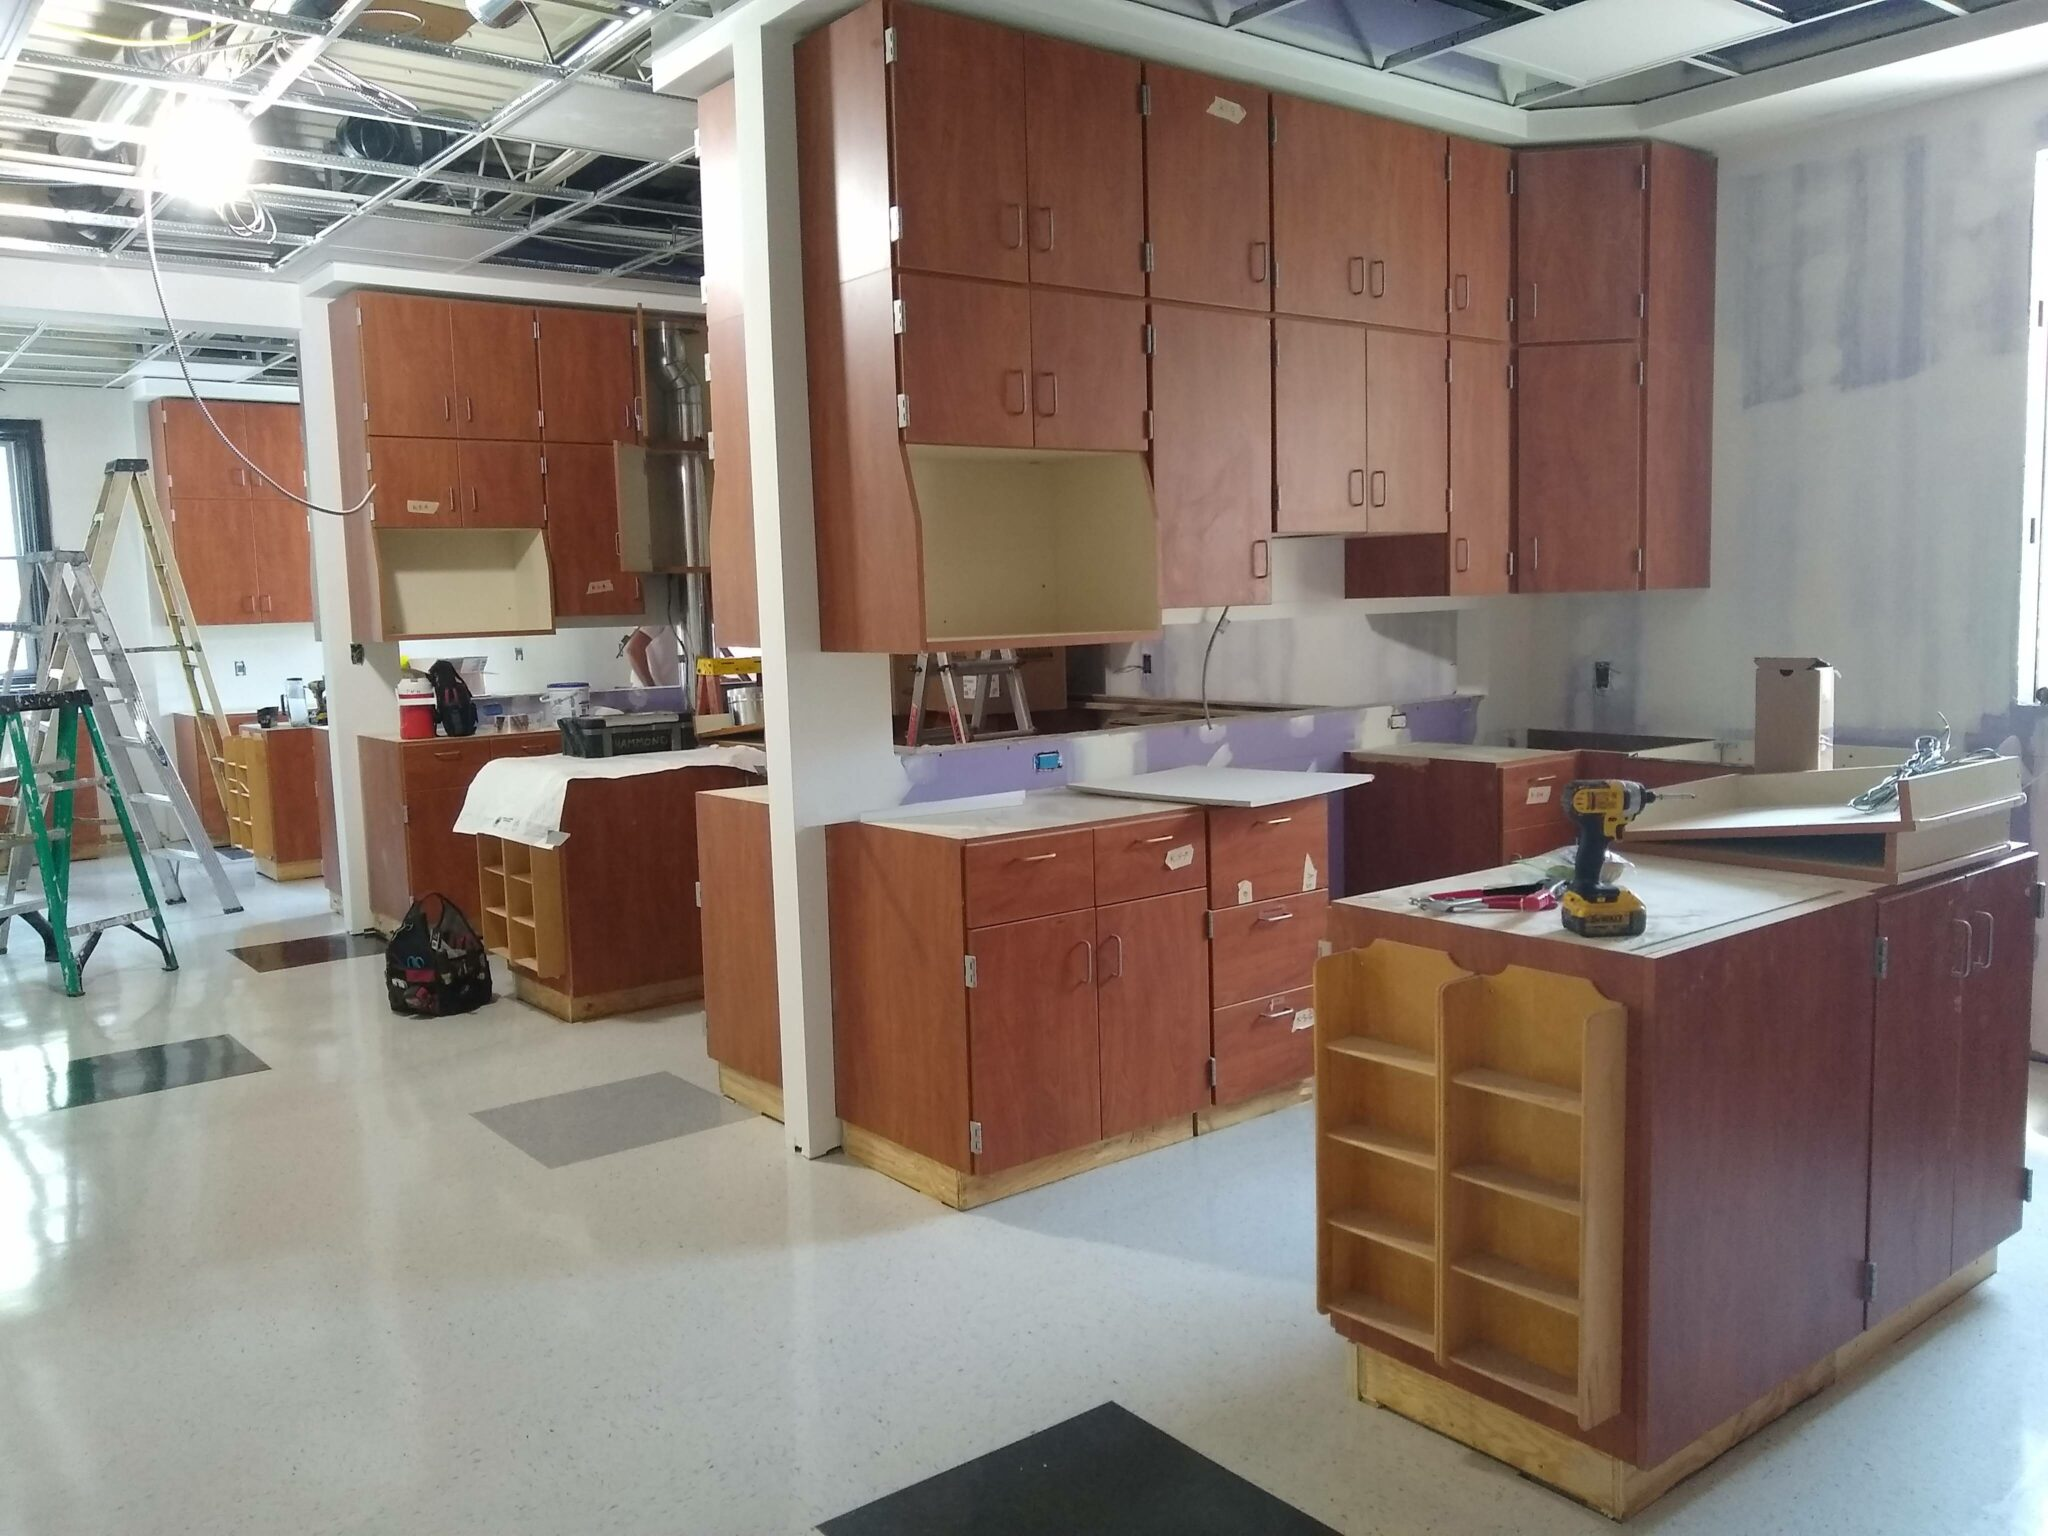 new family consumer sciences room in progress